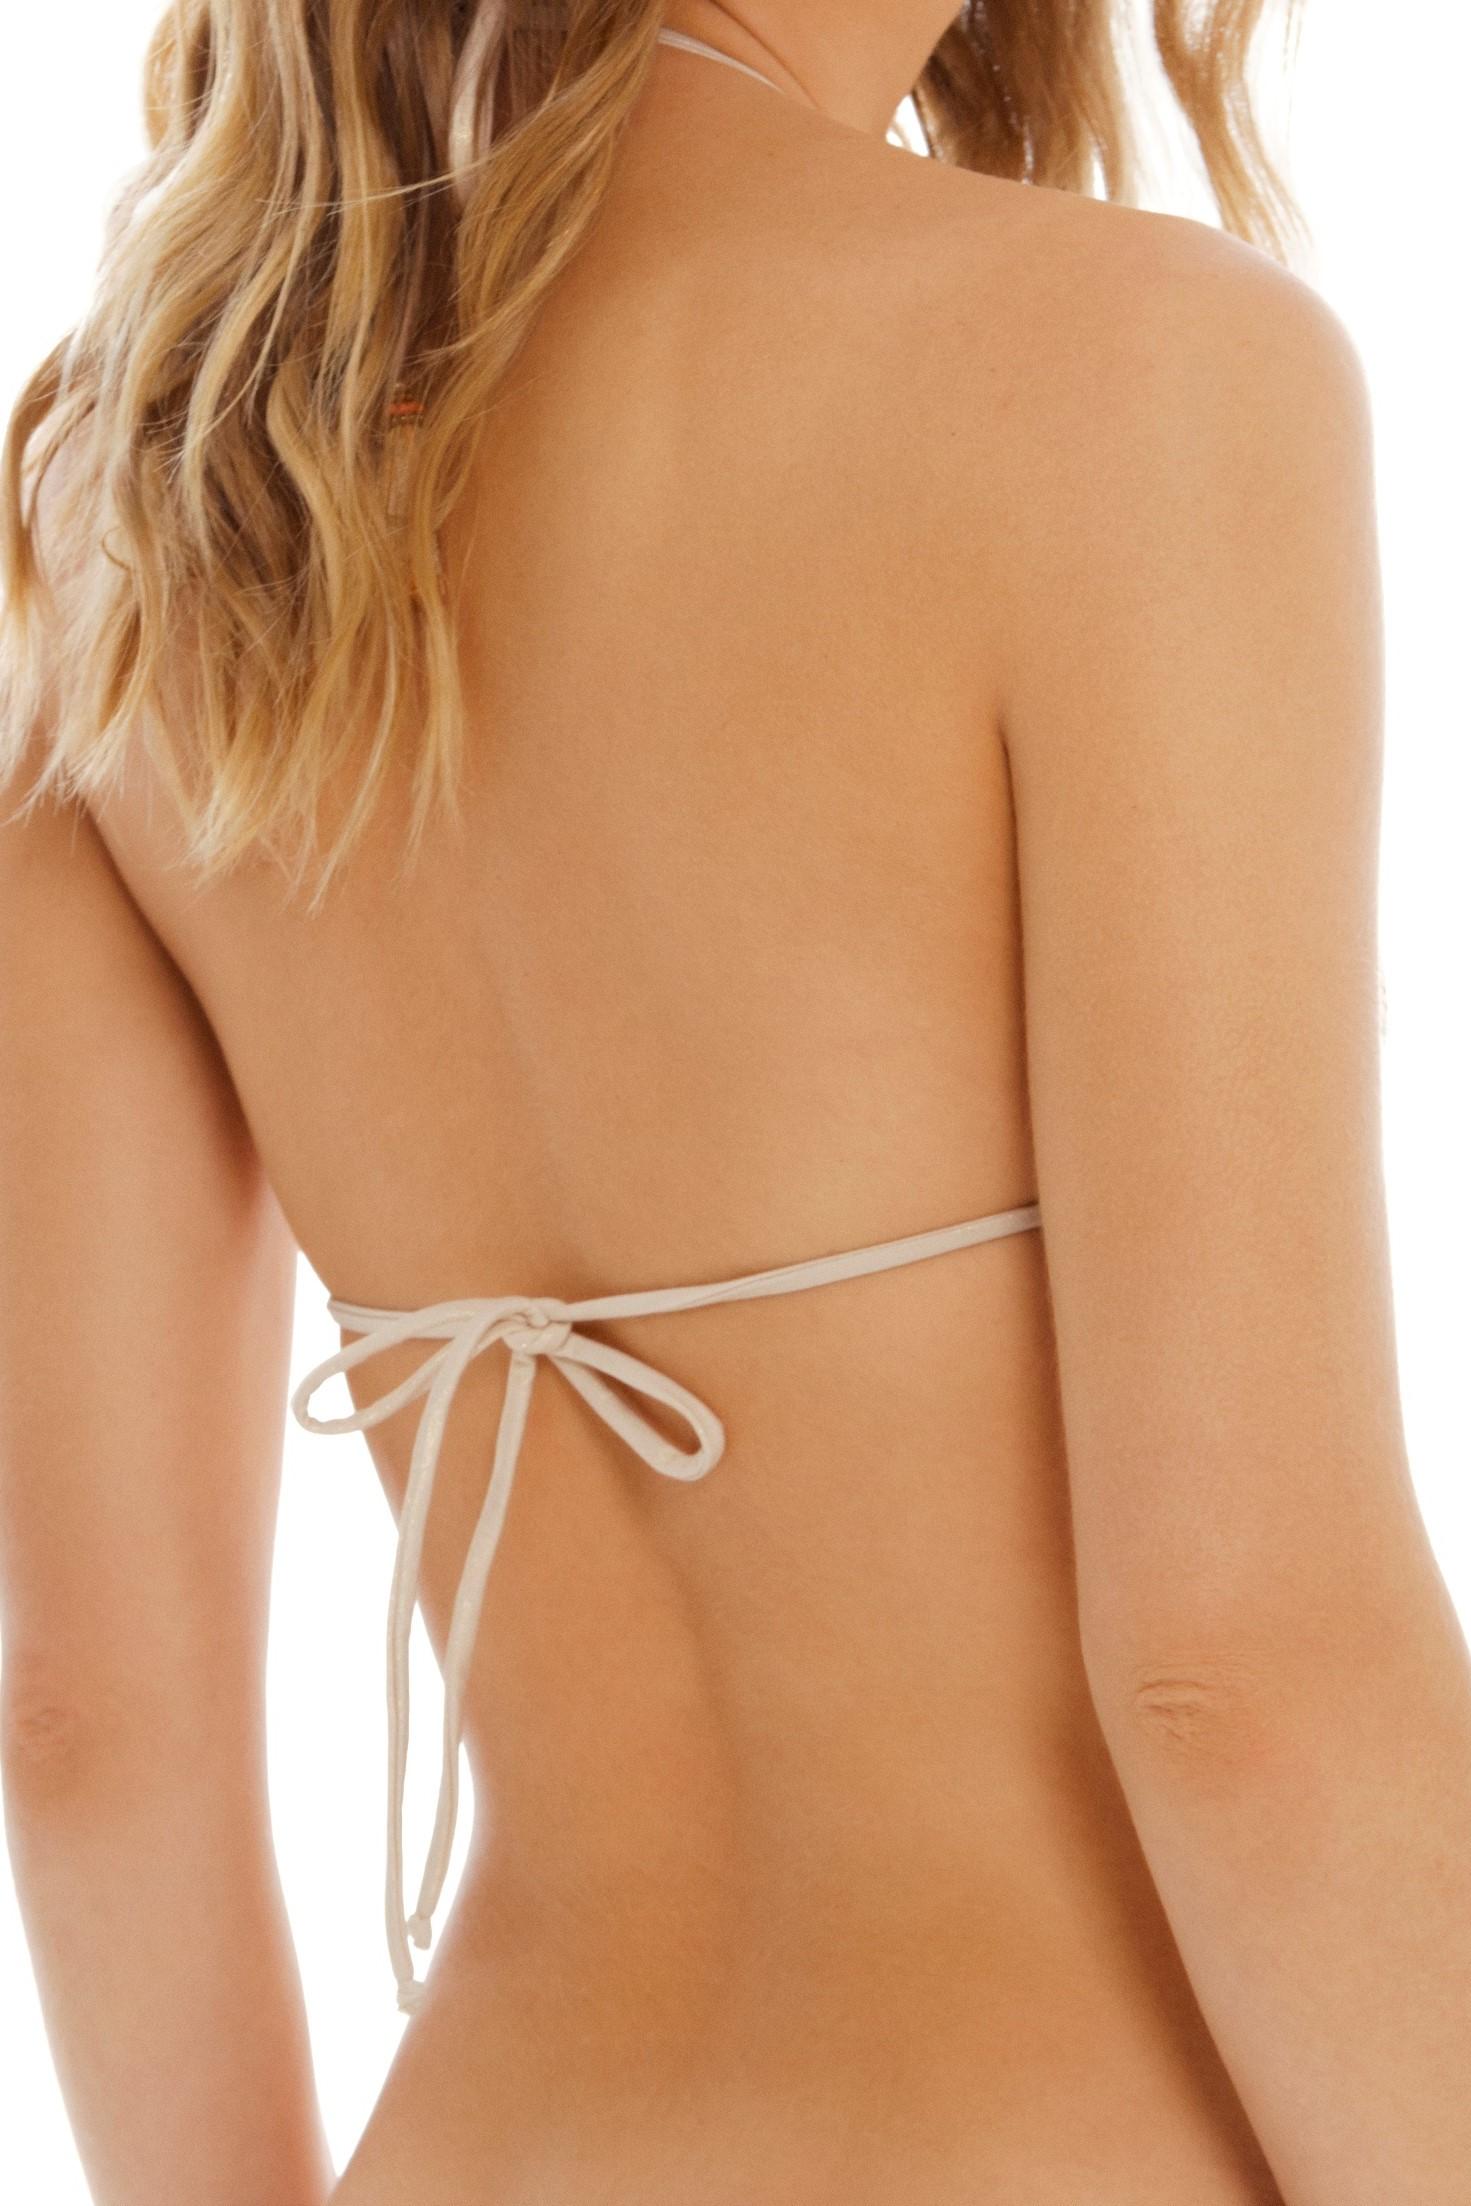 Cosita Linda Bohemian Traveler Triangle Bikini Top Gold